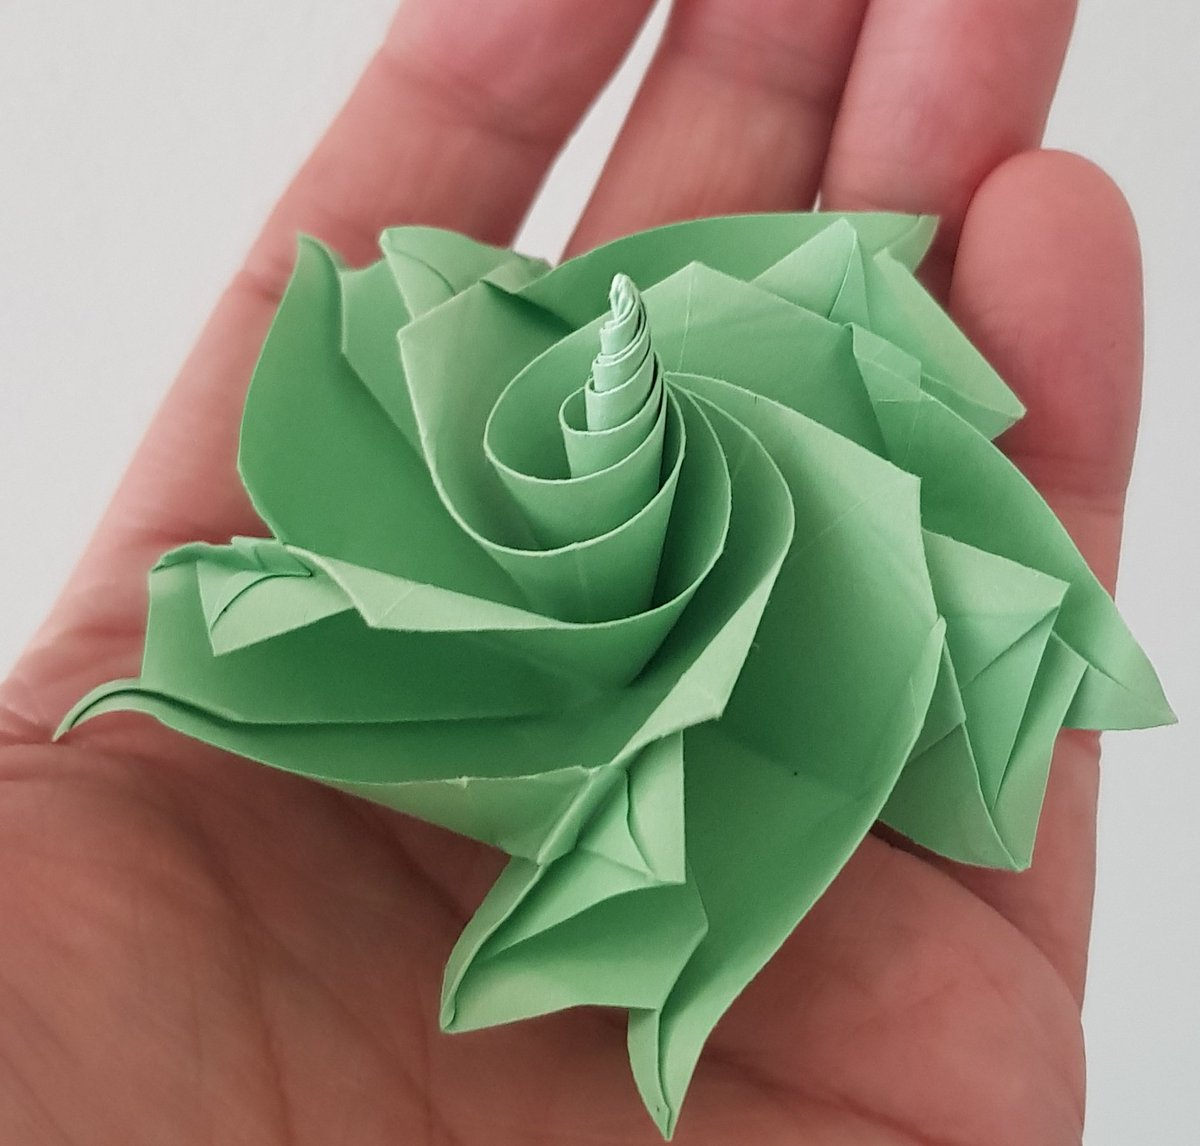 Origami by sesames sesamesorigami twitter 0 replies 0 retweets 2 likes mightylinksfo